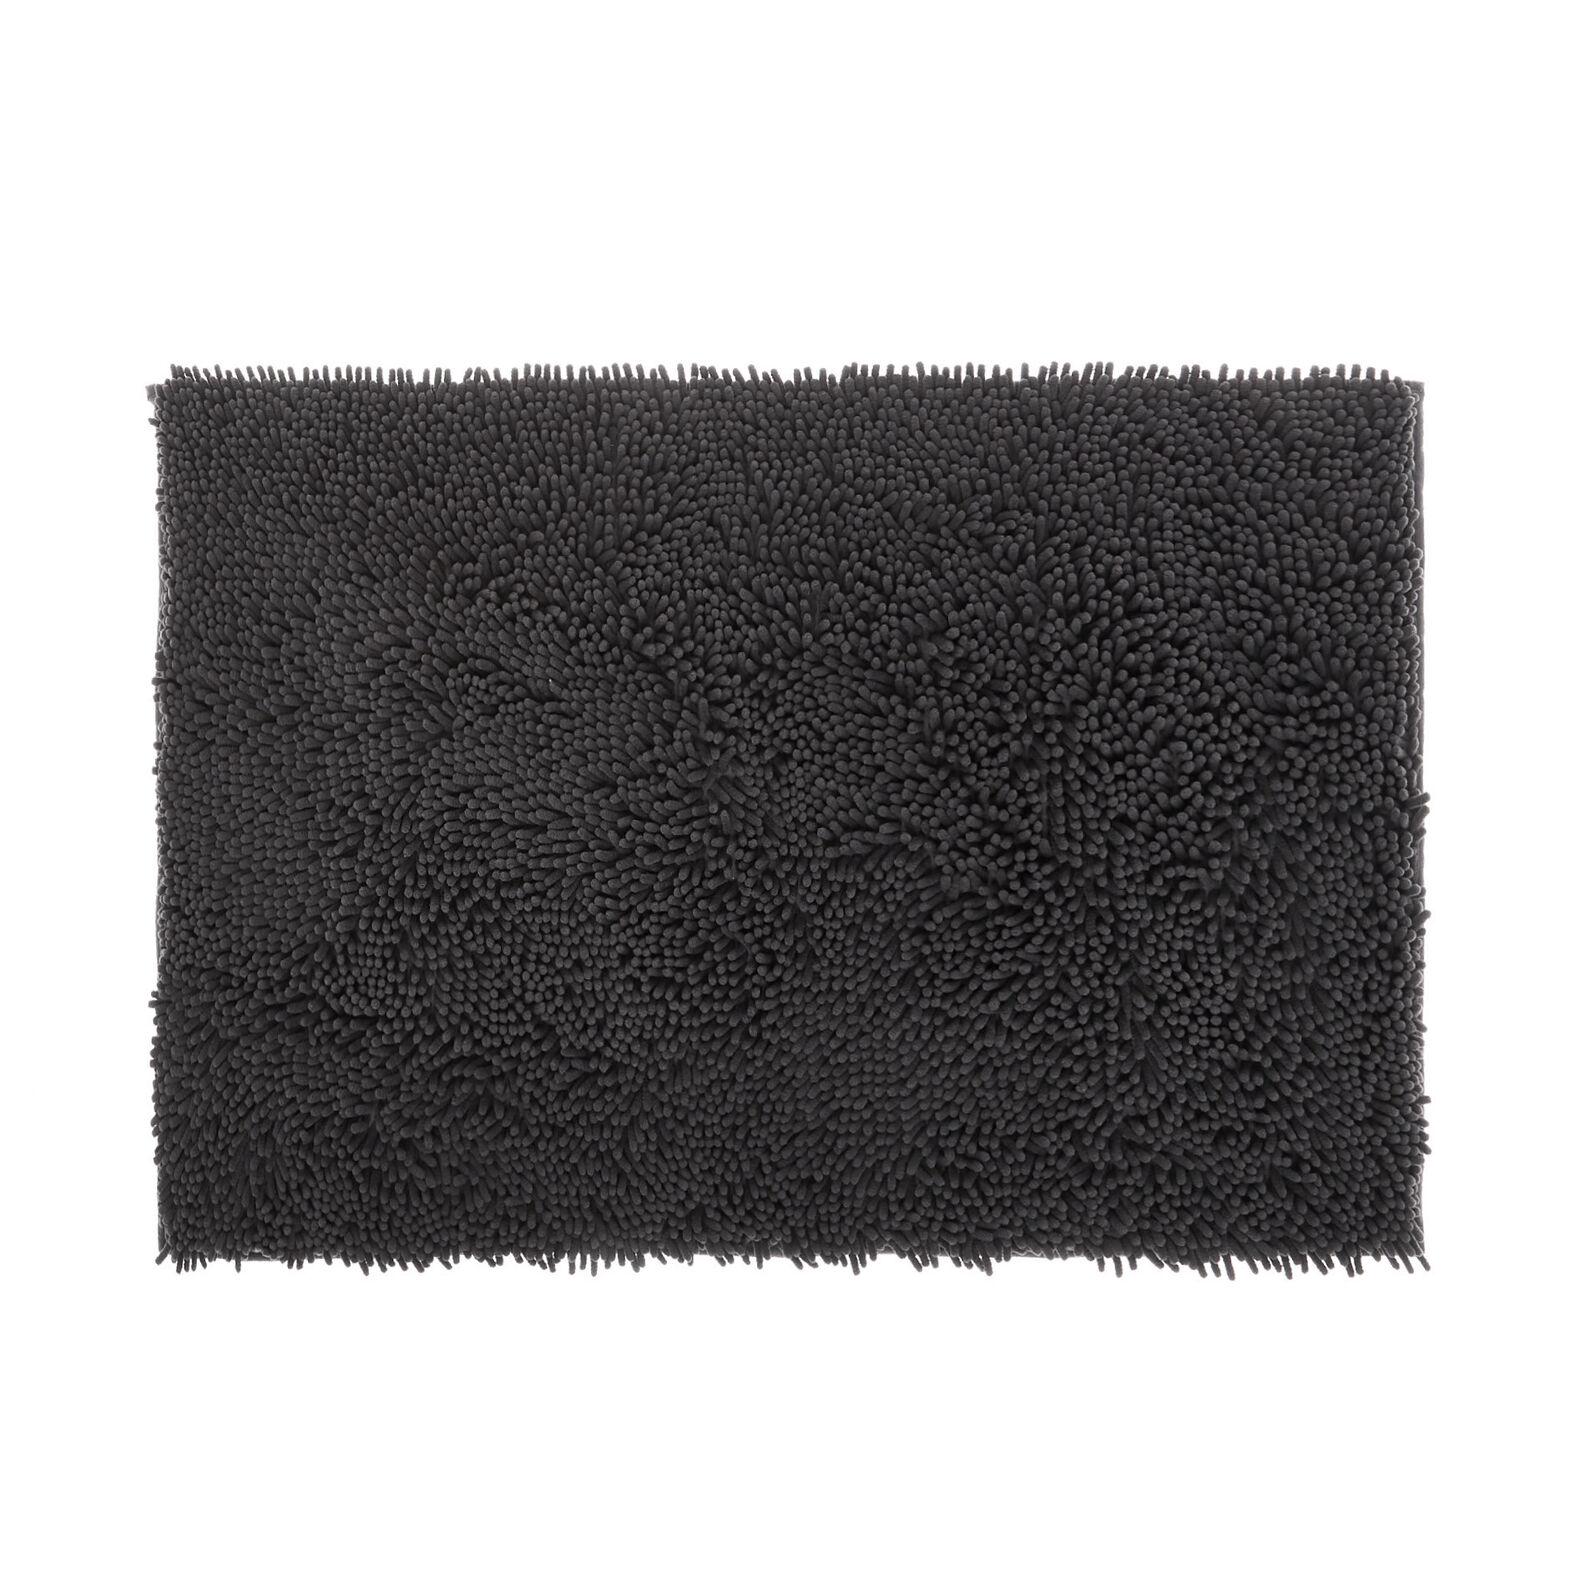 Shaggy microfiber bath mat